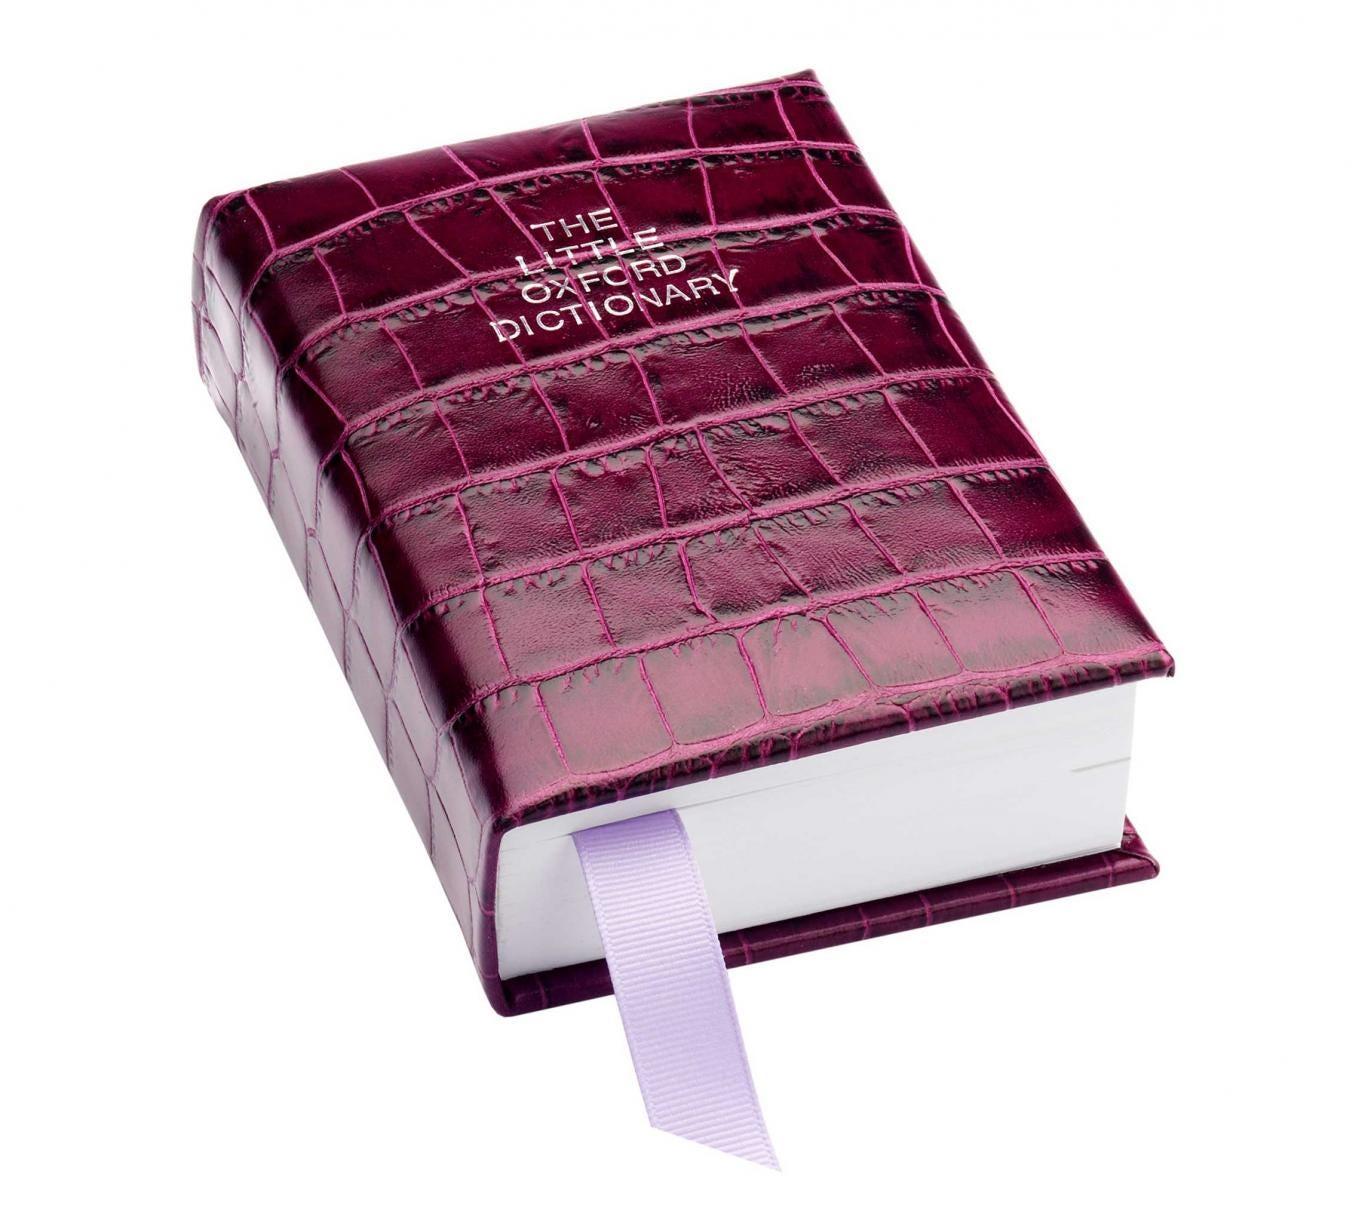 13. Mock croc 'Oxford English Dictionary', £55, Aspinal of London